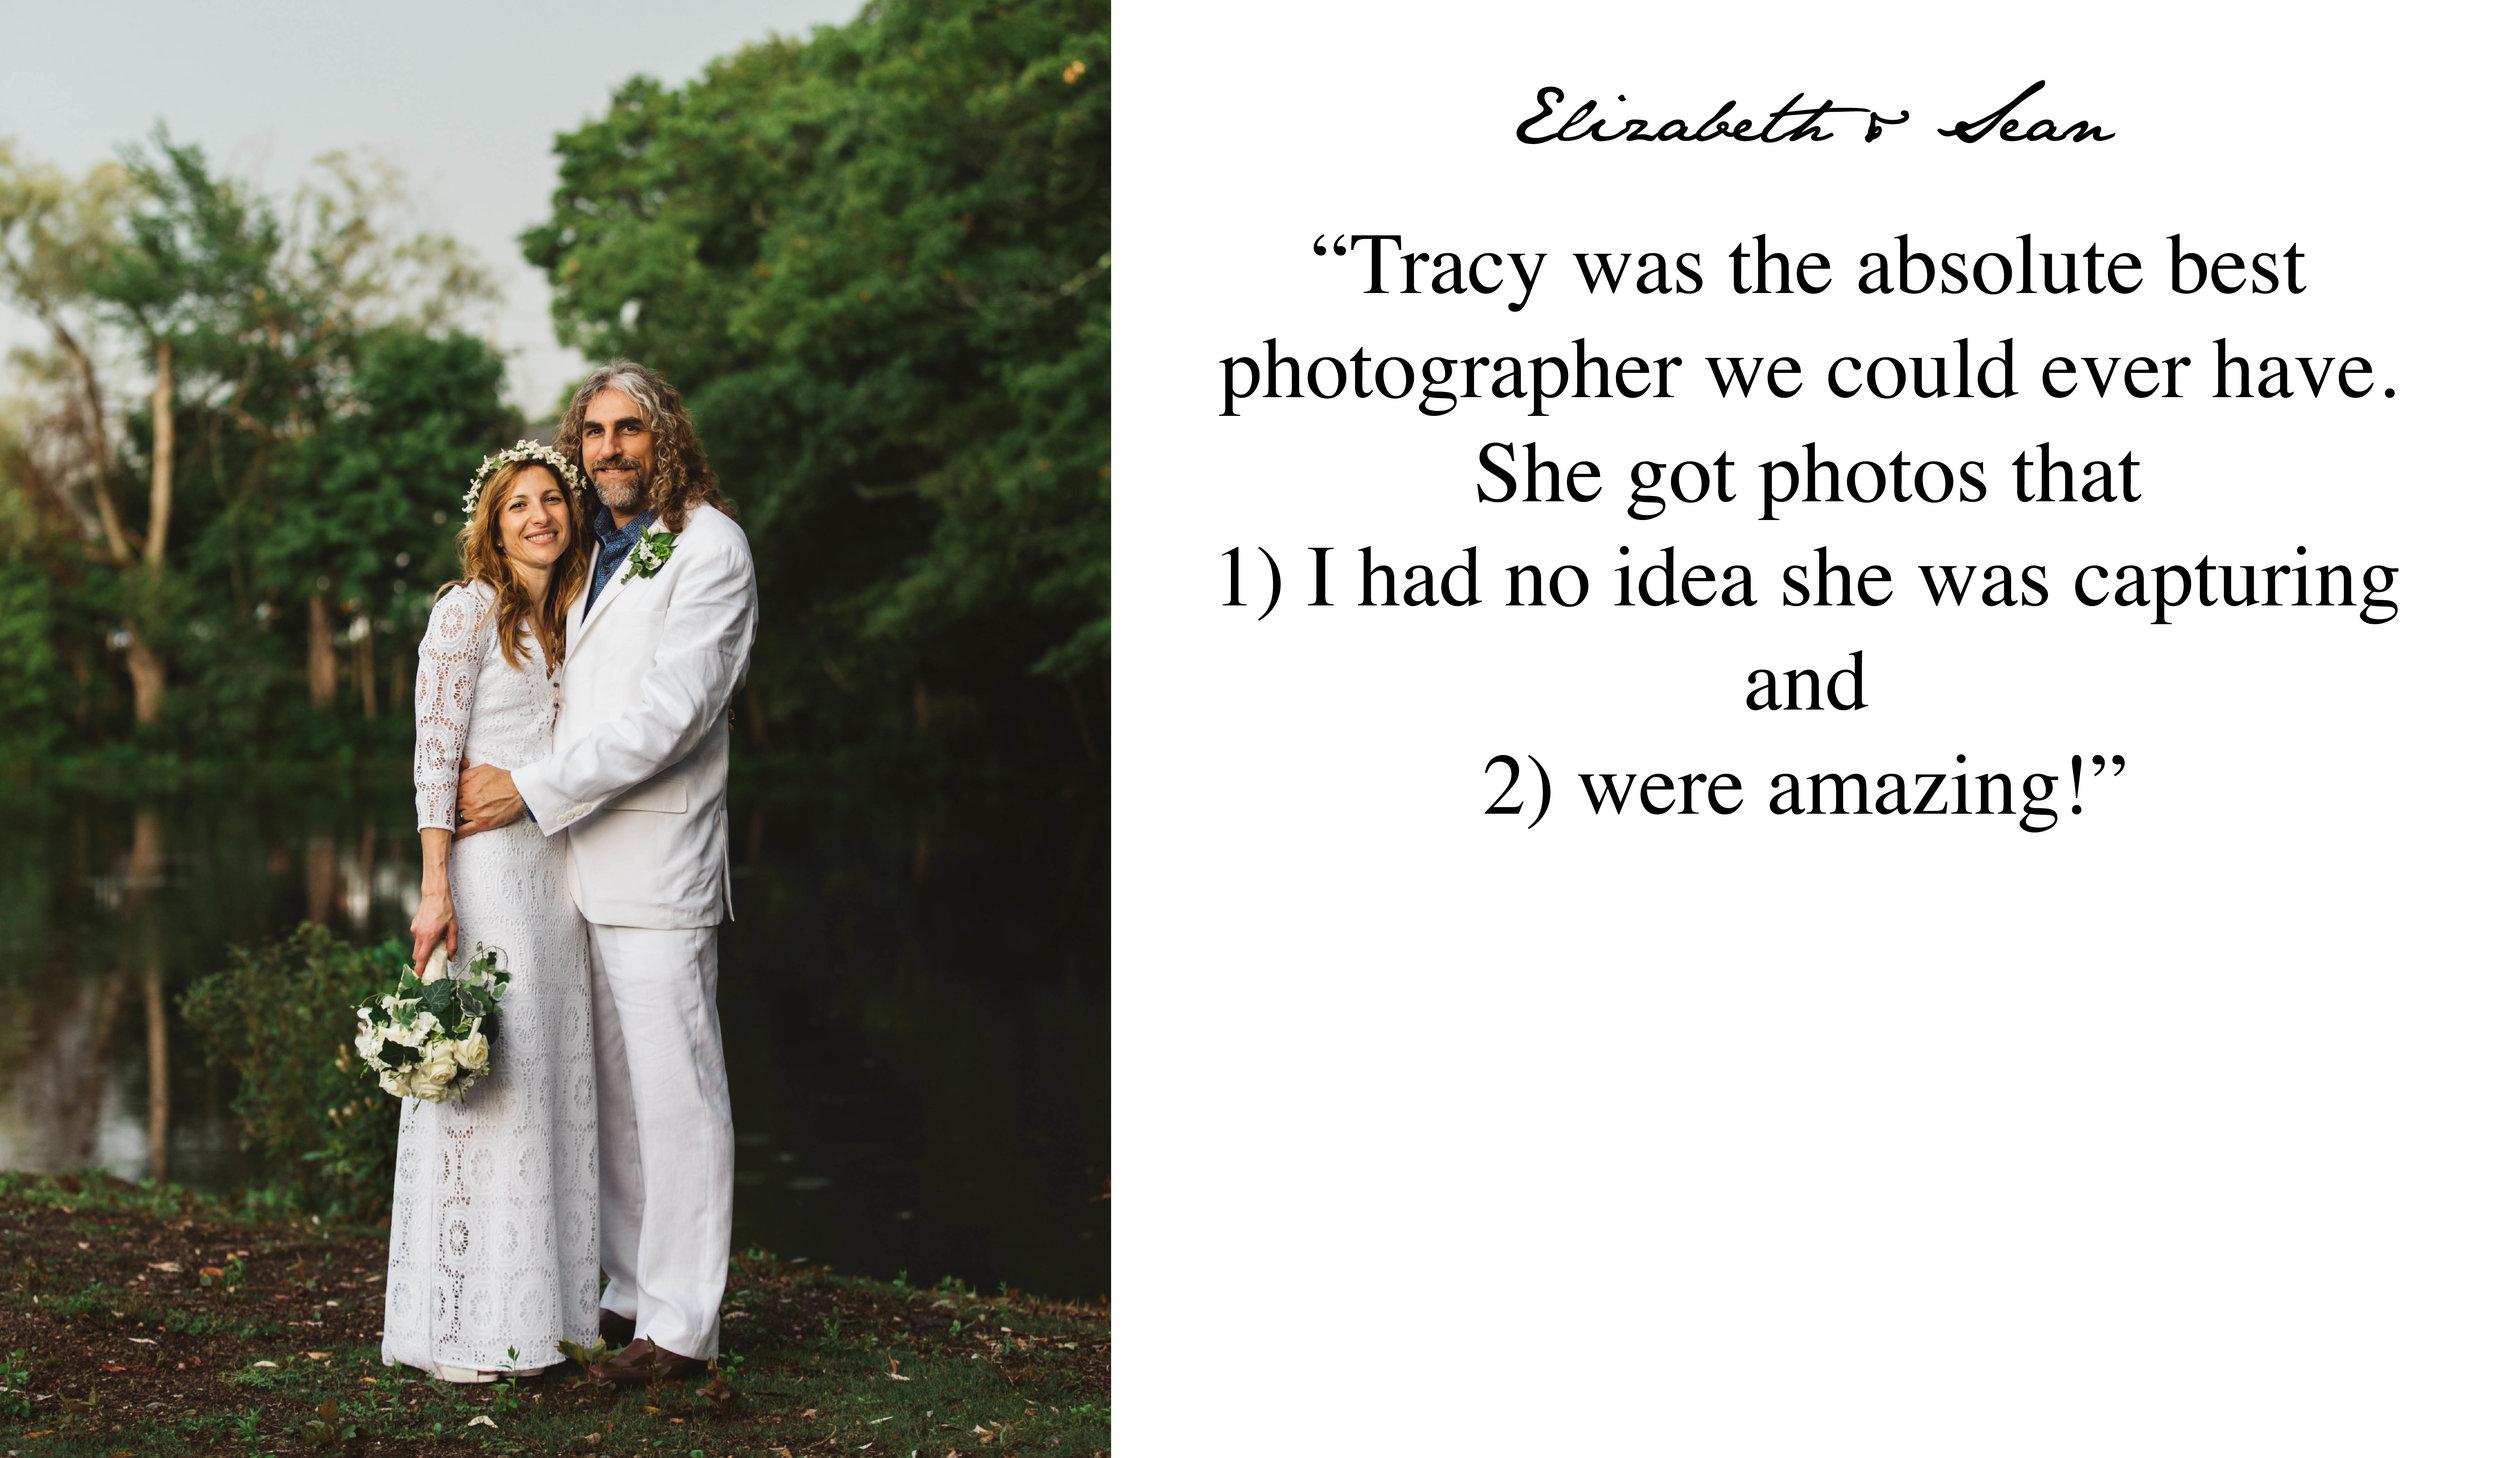 5 Star Wedding Review - Boston Intimate Wedding Photographer